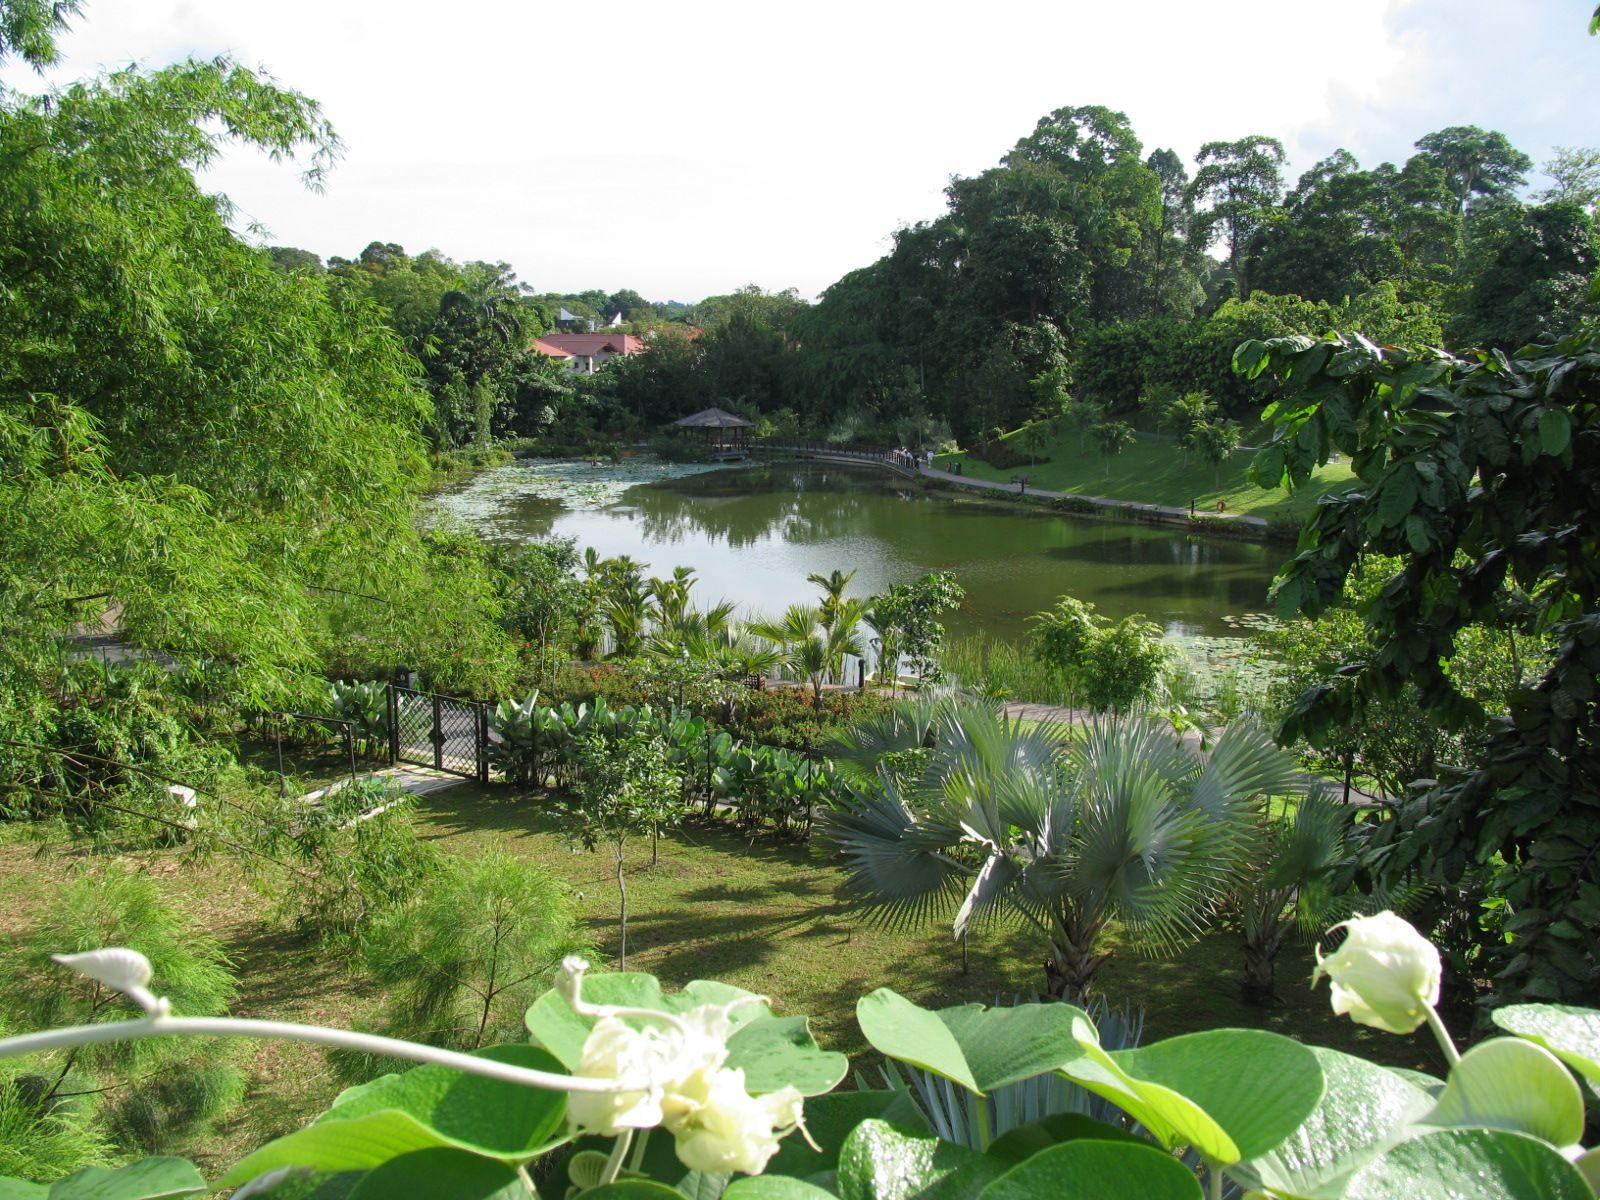 Singapore Botanical Gardens A Visit Of Wondrous Nature Gardens Of The World Singapore Botanic Gardens Singapore Garden